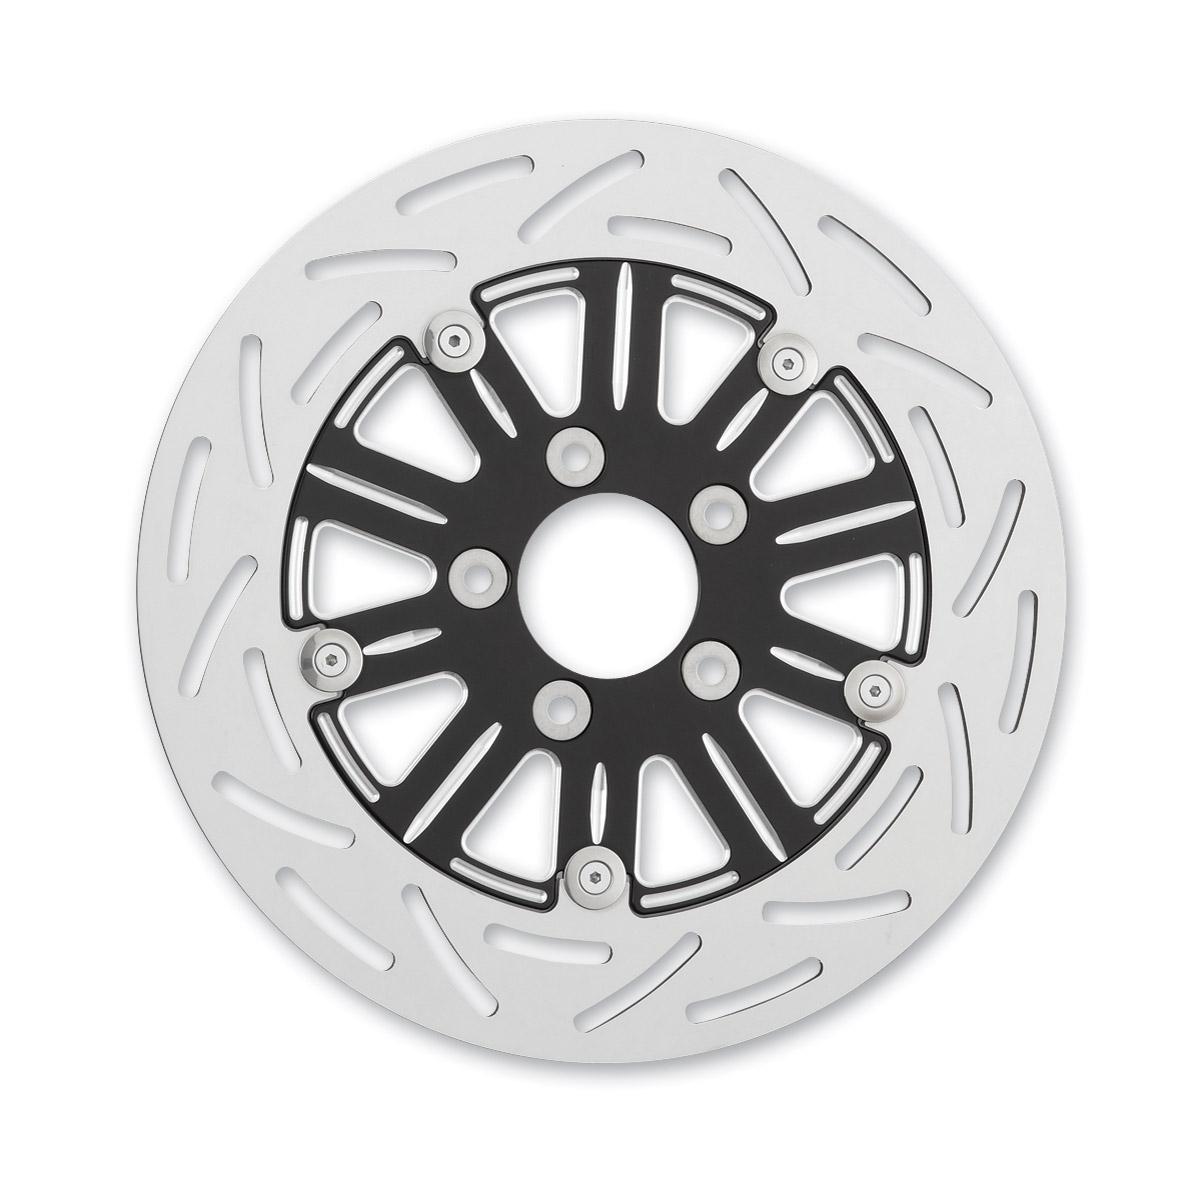 Arlen Ness 10 Gauge Brake Rotor